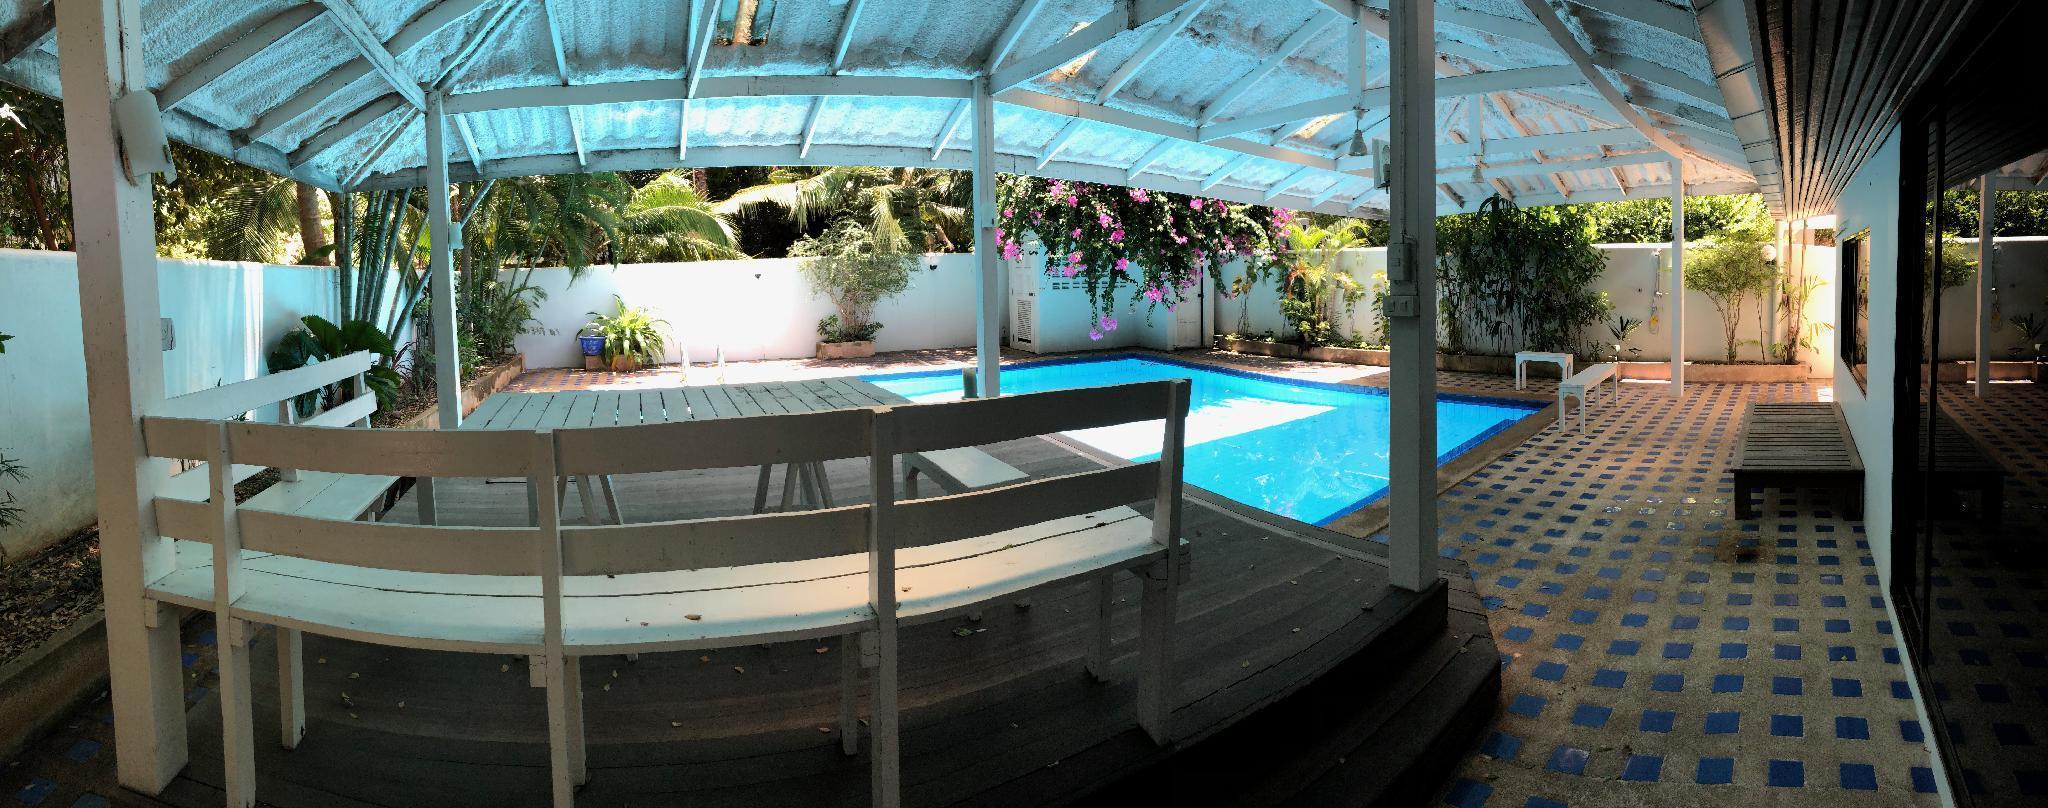 Beach house, private pool, บ้านเดี่ยว 2 ห้องนอน 3 ห้องน้ำส่วนตัว ขนาด 200 ตร.ม. – หาดวงอมาตย์